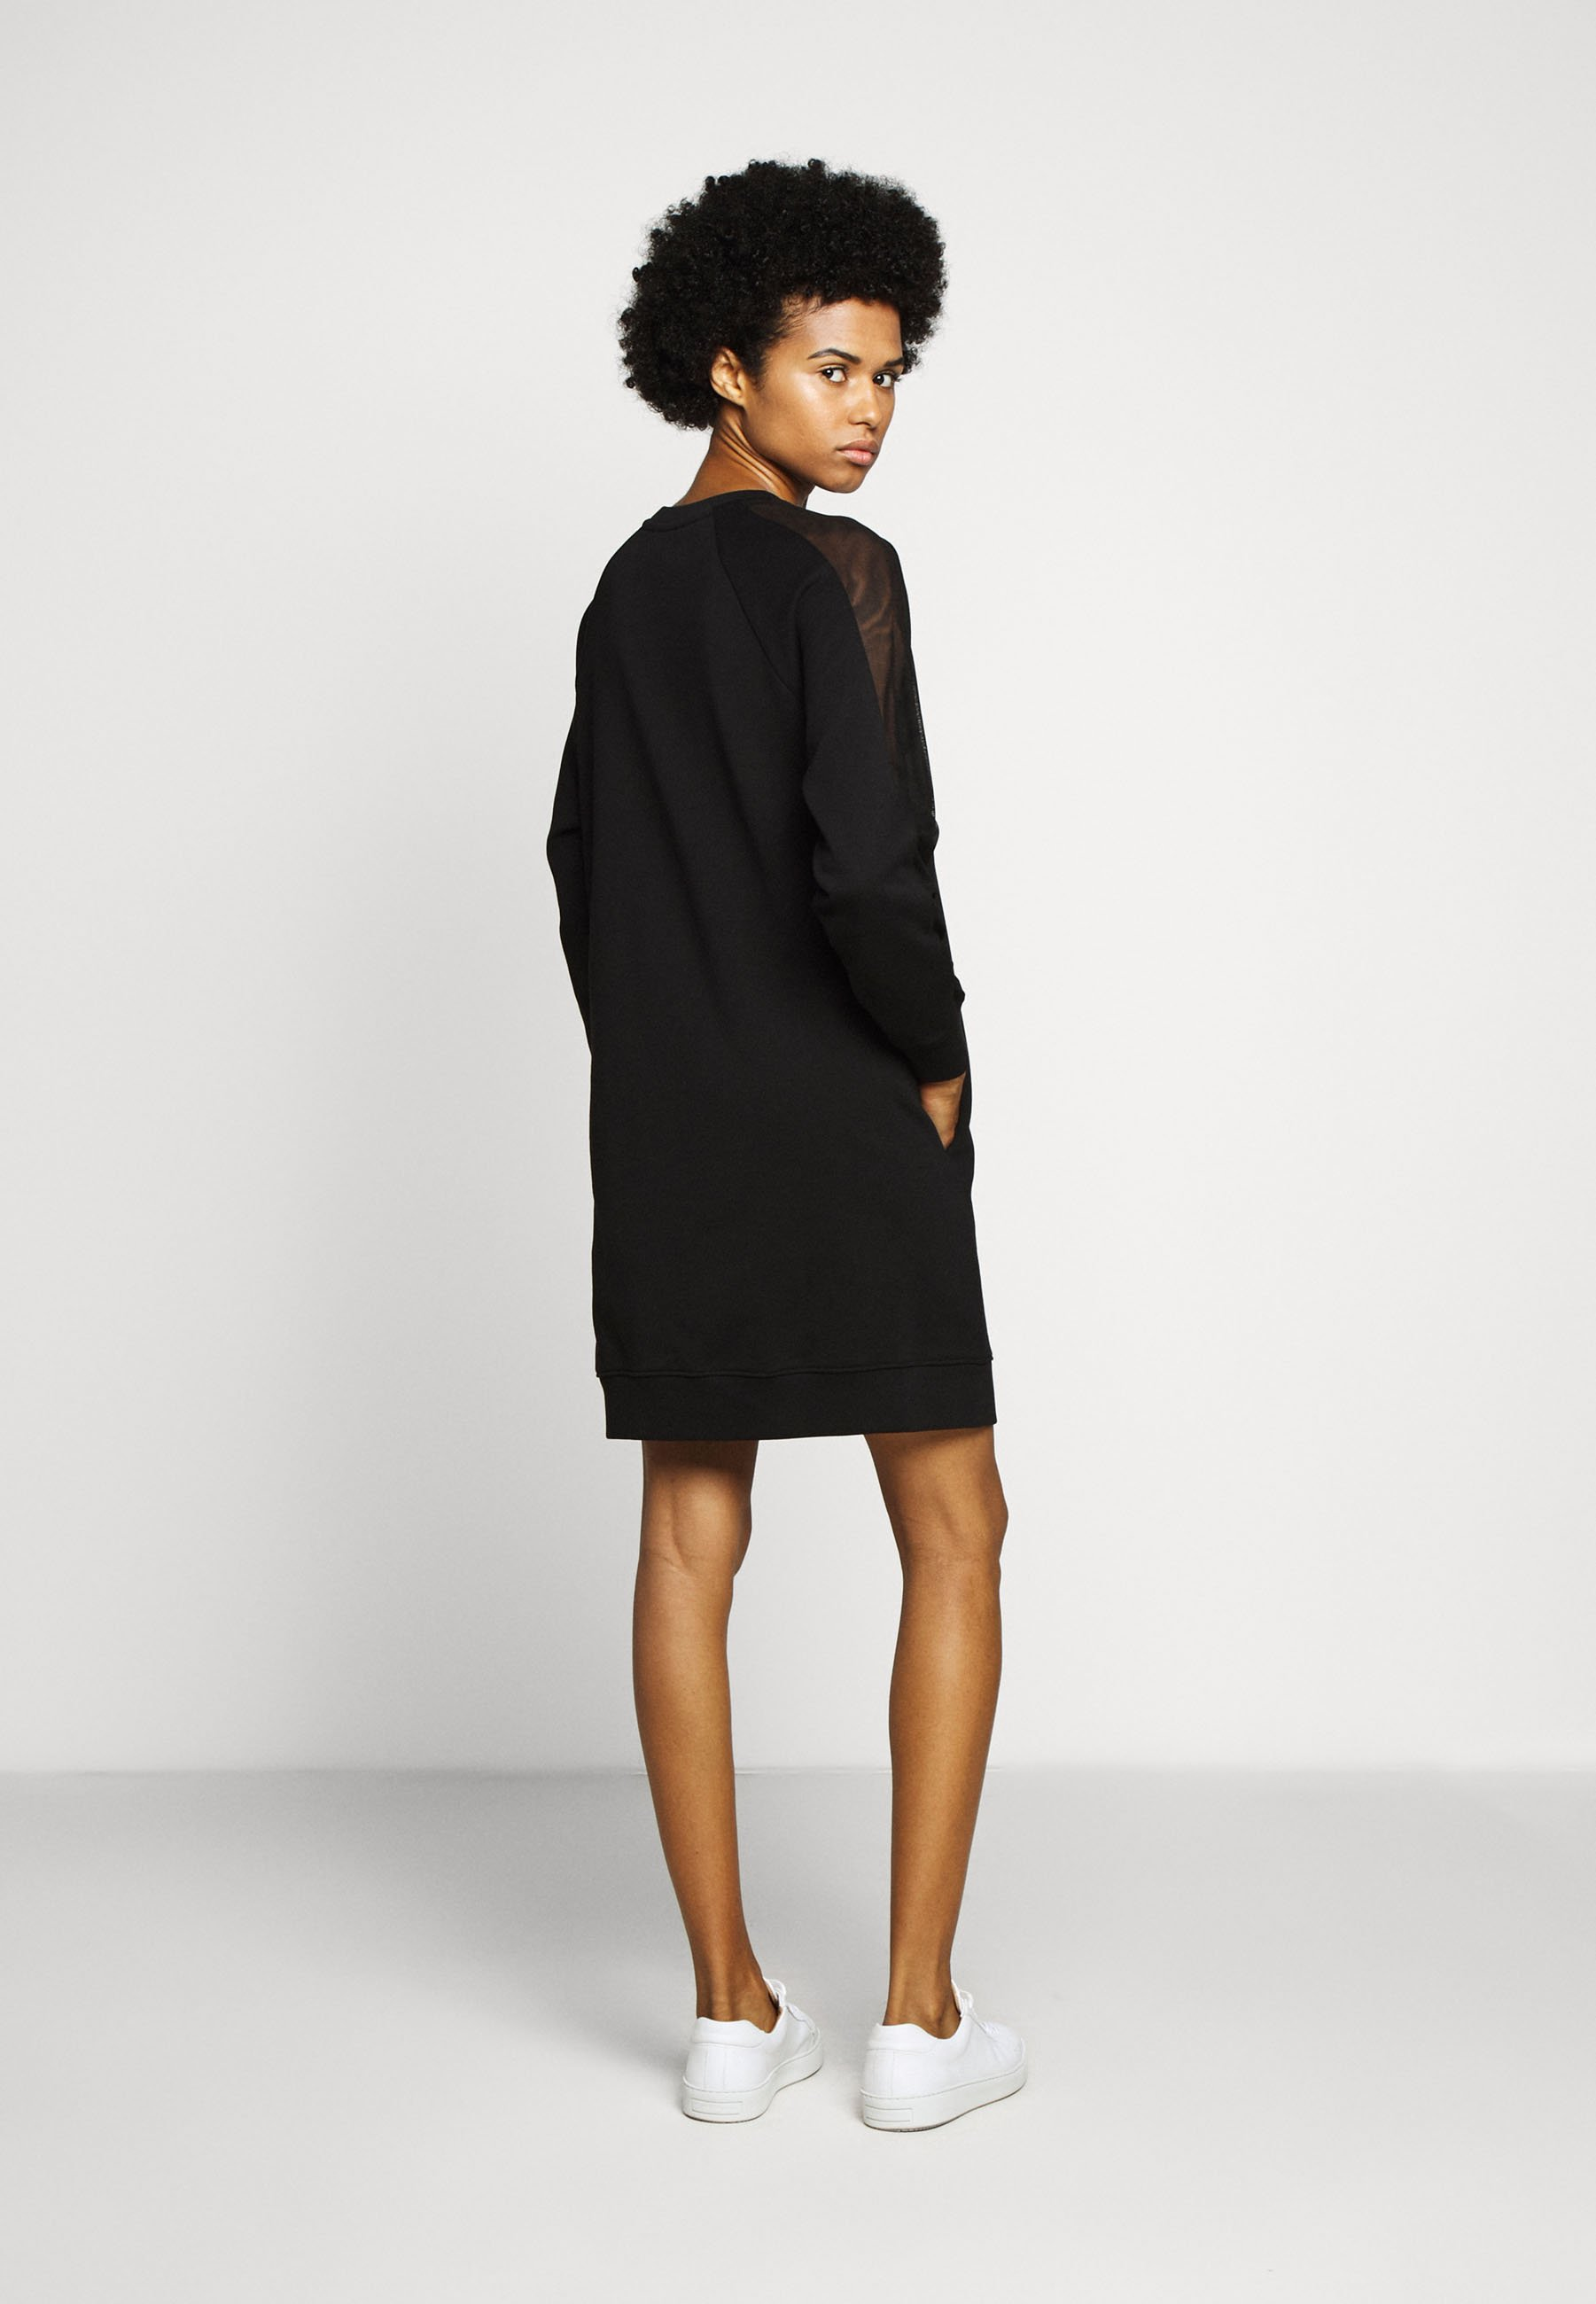 Discounts Women's Clothing KARL LAGERFELD DRESS Day dress black j7sQPahJ1